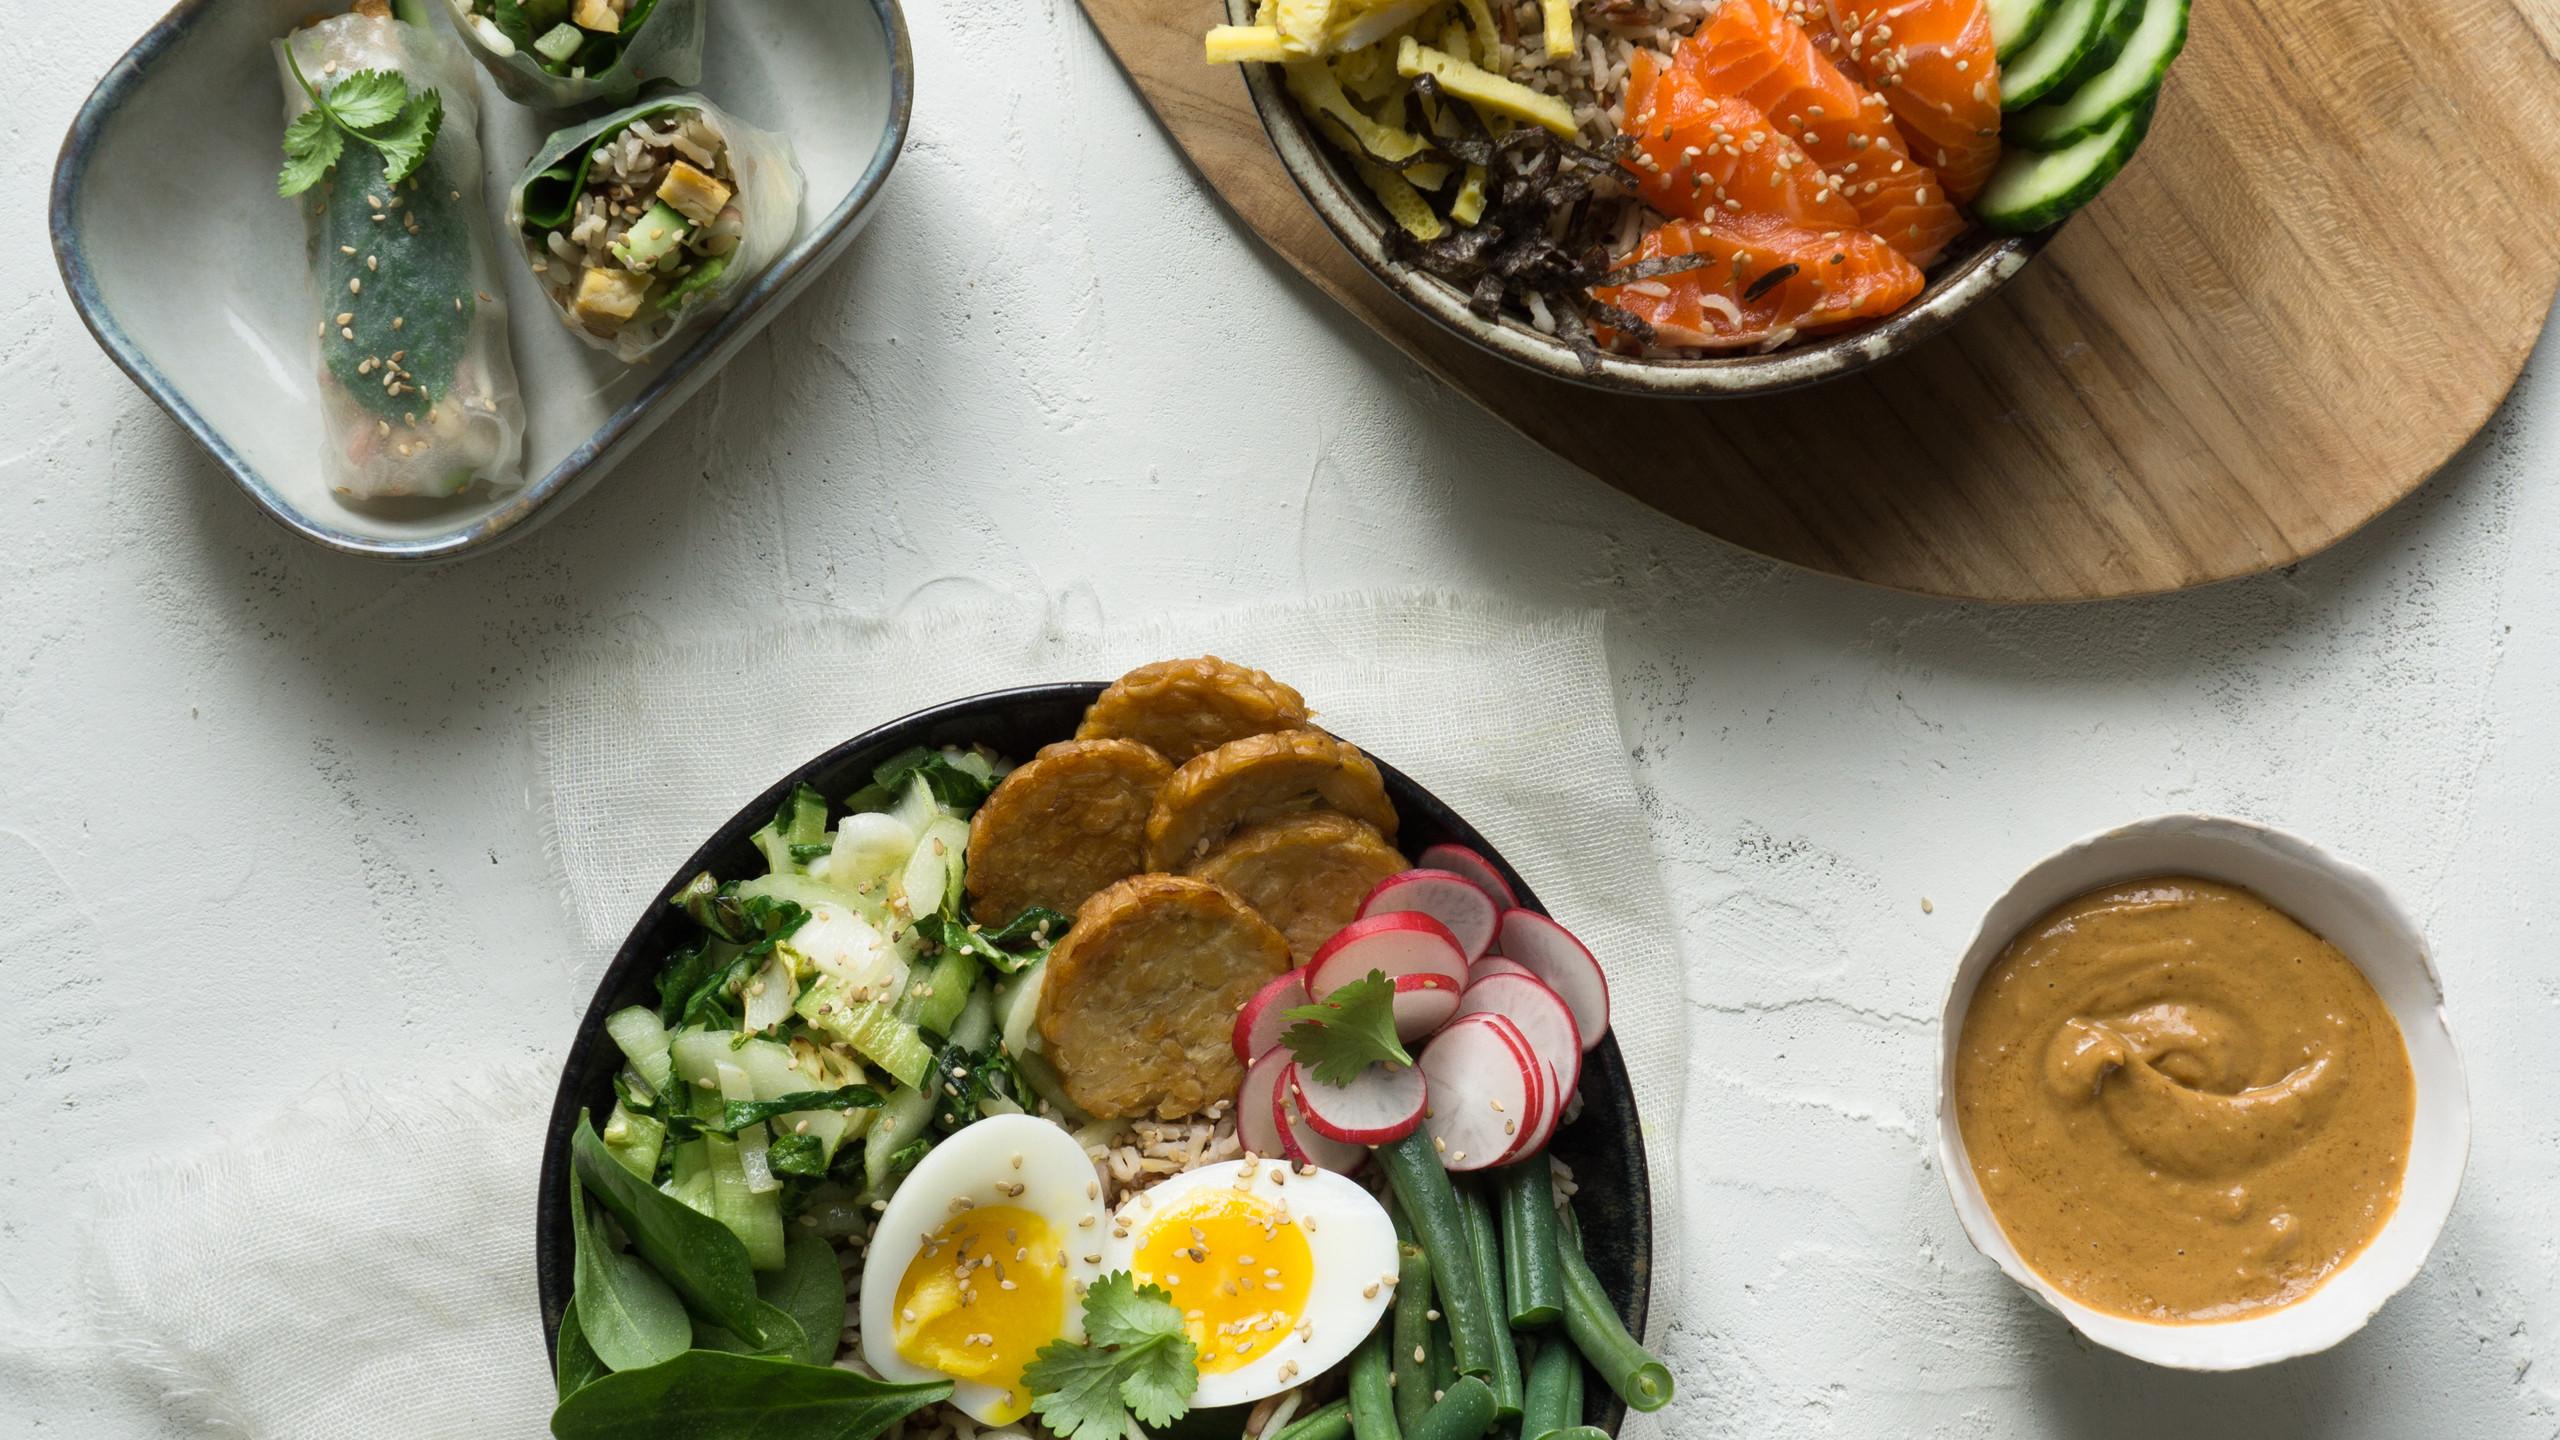 Mealprep Combo 1 - Asian Delight